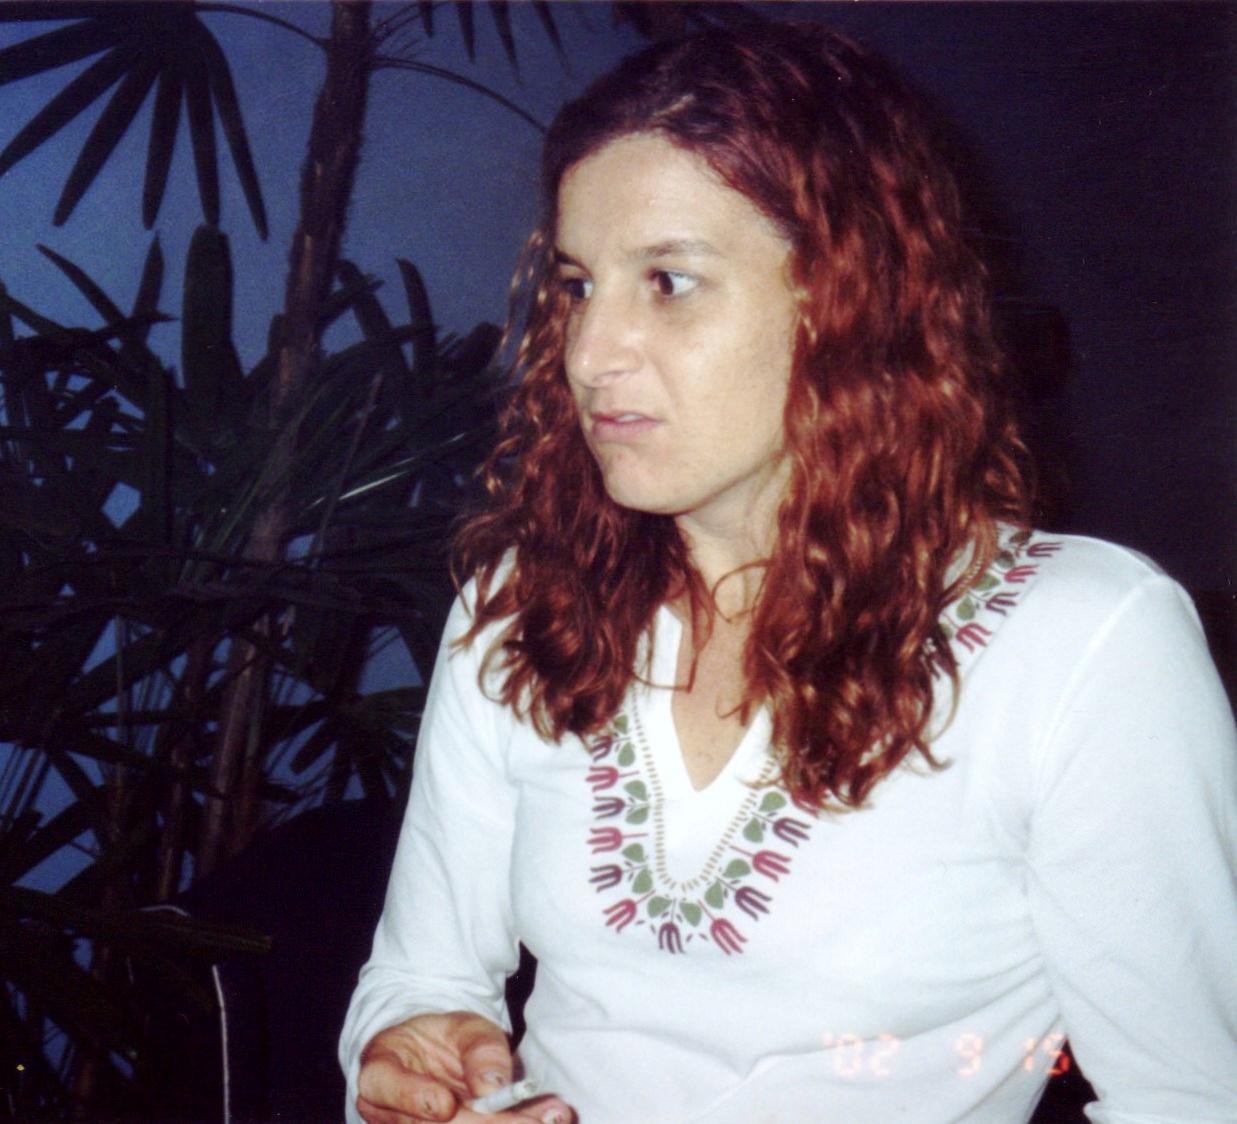 http://1.bp.blogspot.com/-H8JzHpMMq8E/T9jVx1B68TI/AAAAAAAAAHA/naj-w5c2s-4/s1600/2003+-+Denise+Bruno.jpg